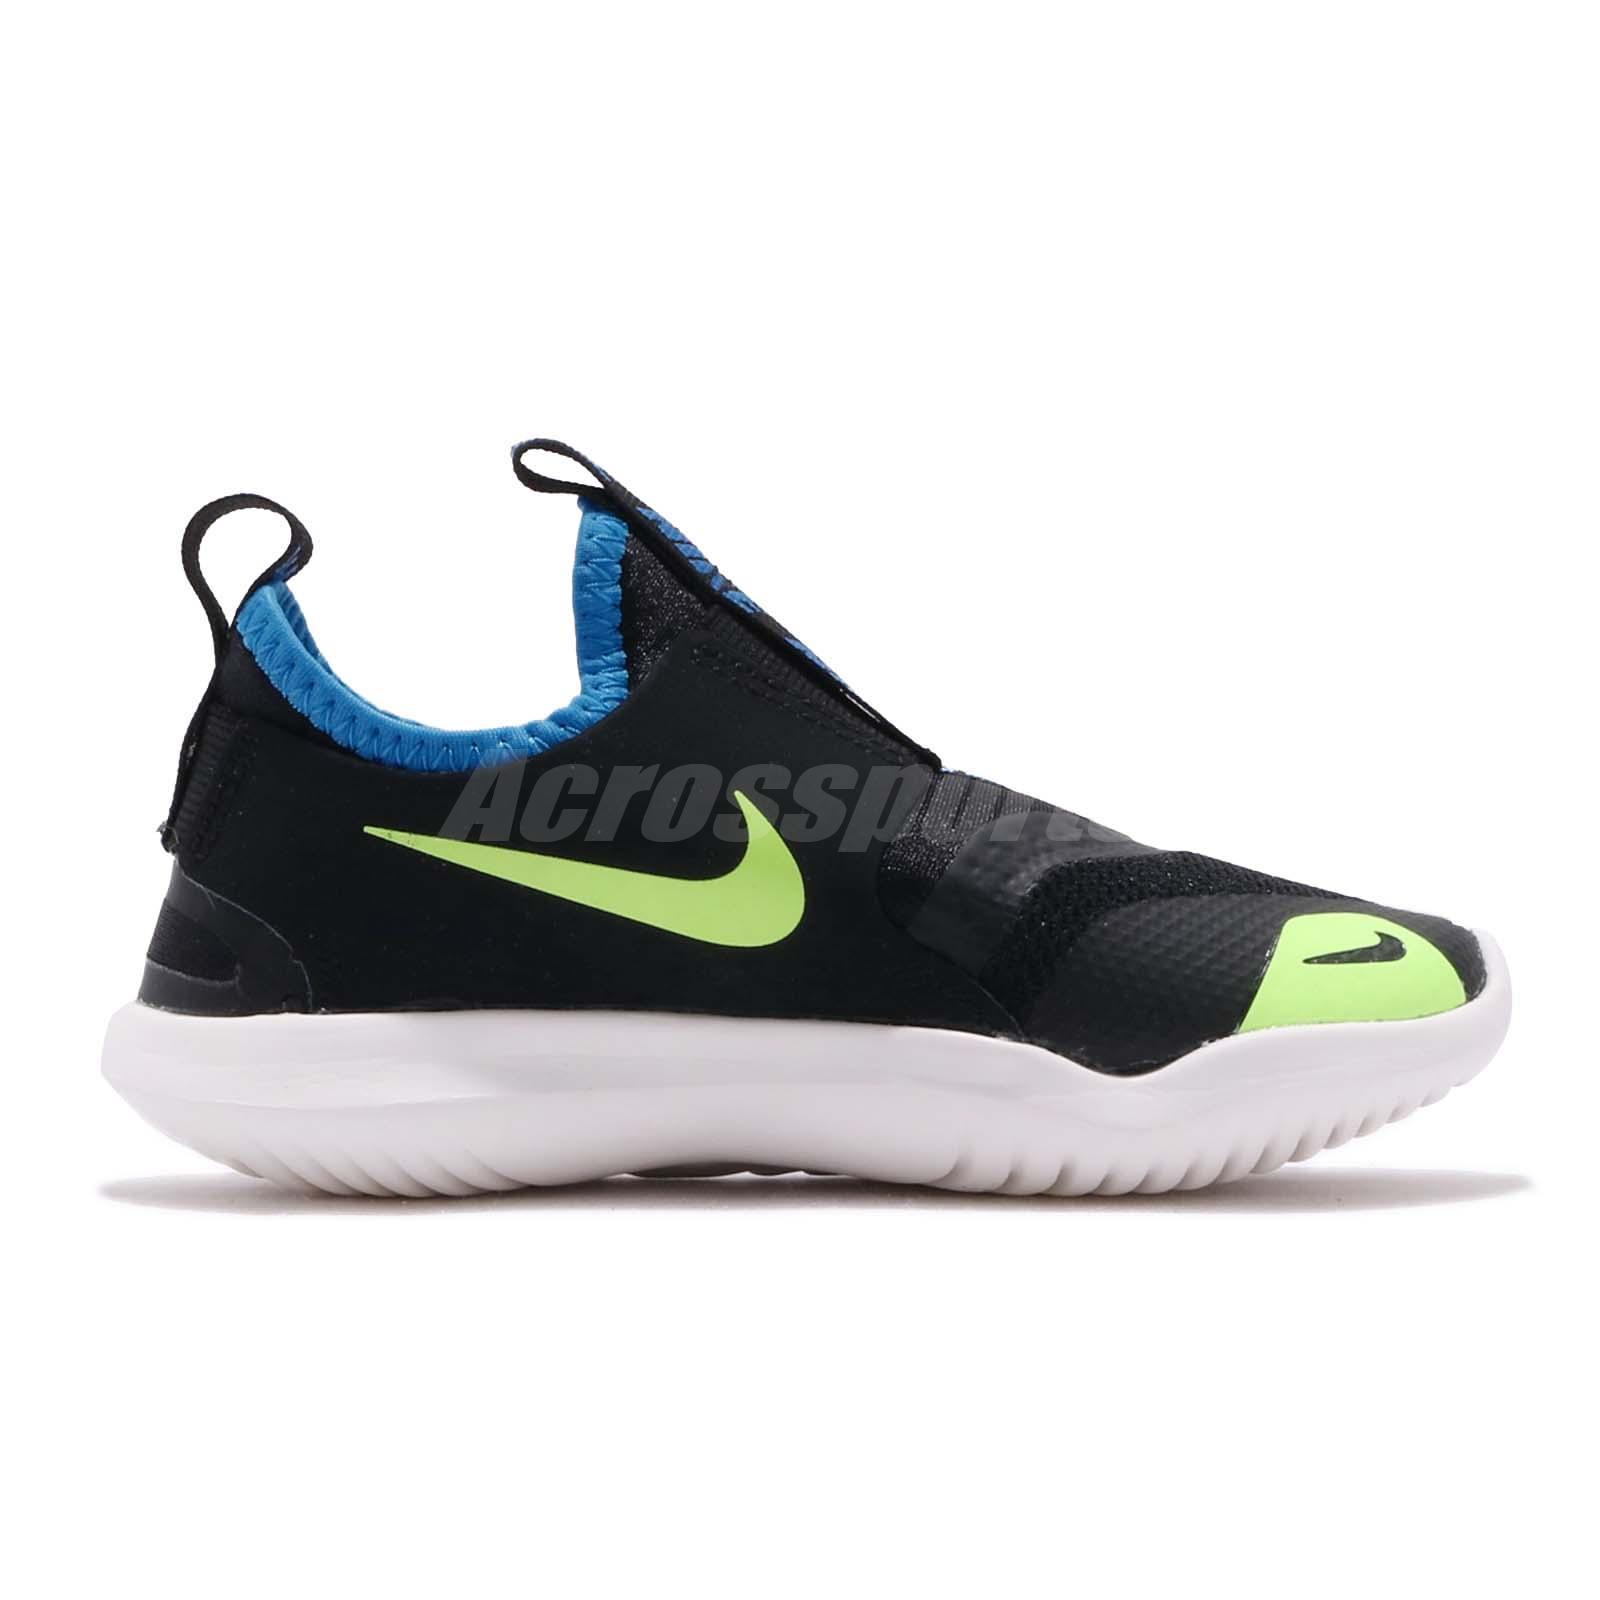 f984f844e72 Nike Flex Runner PS Black Volt White Preschool Kids Running Shoes ...